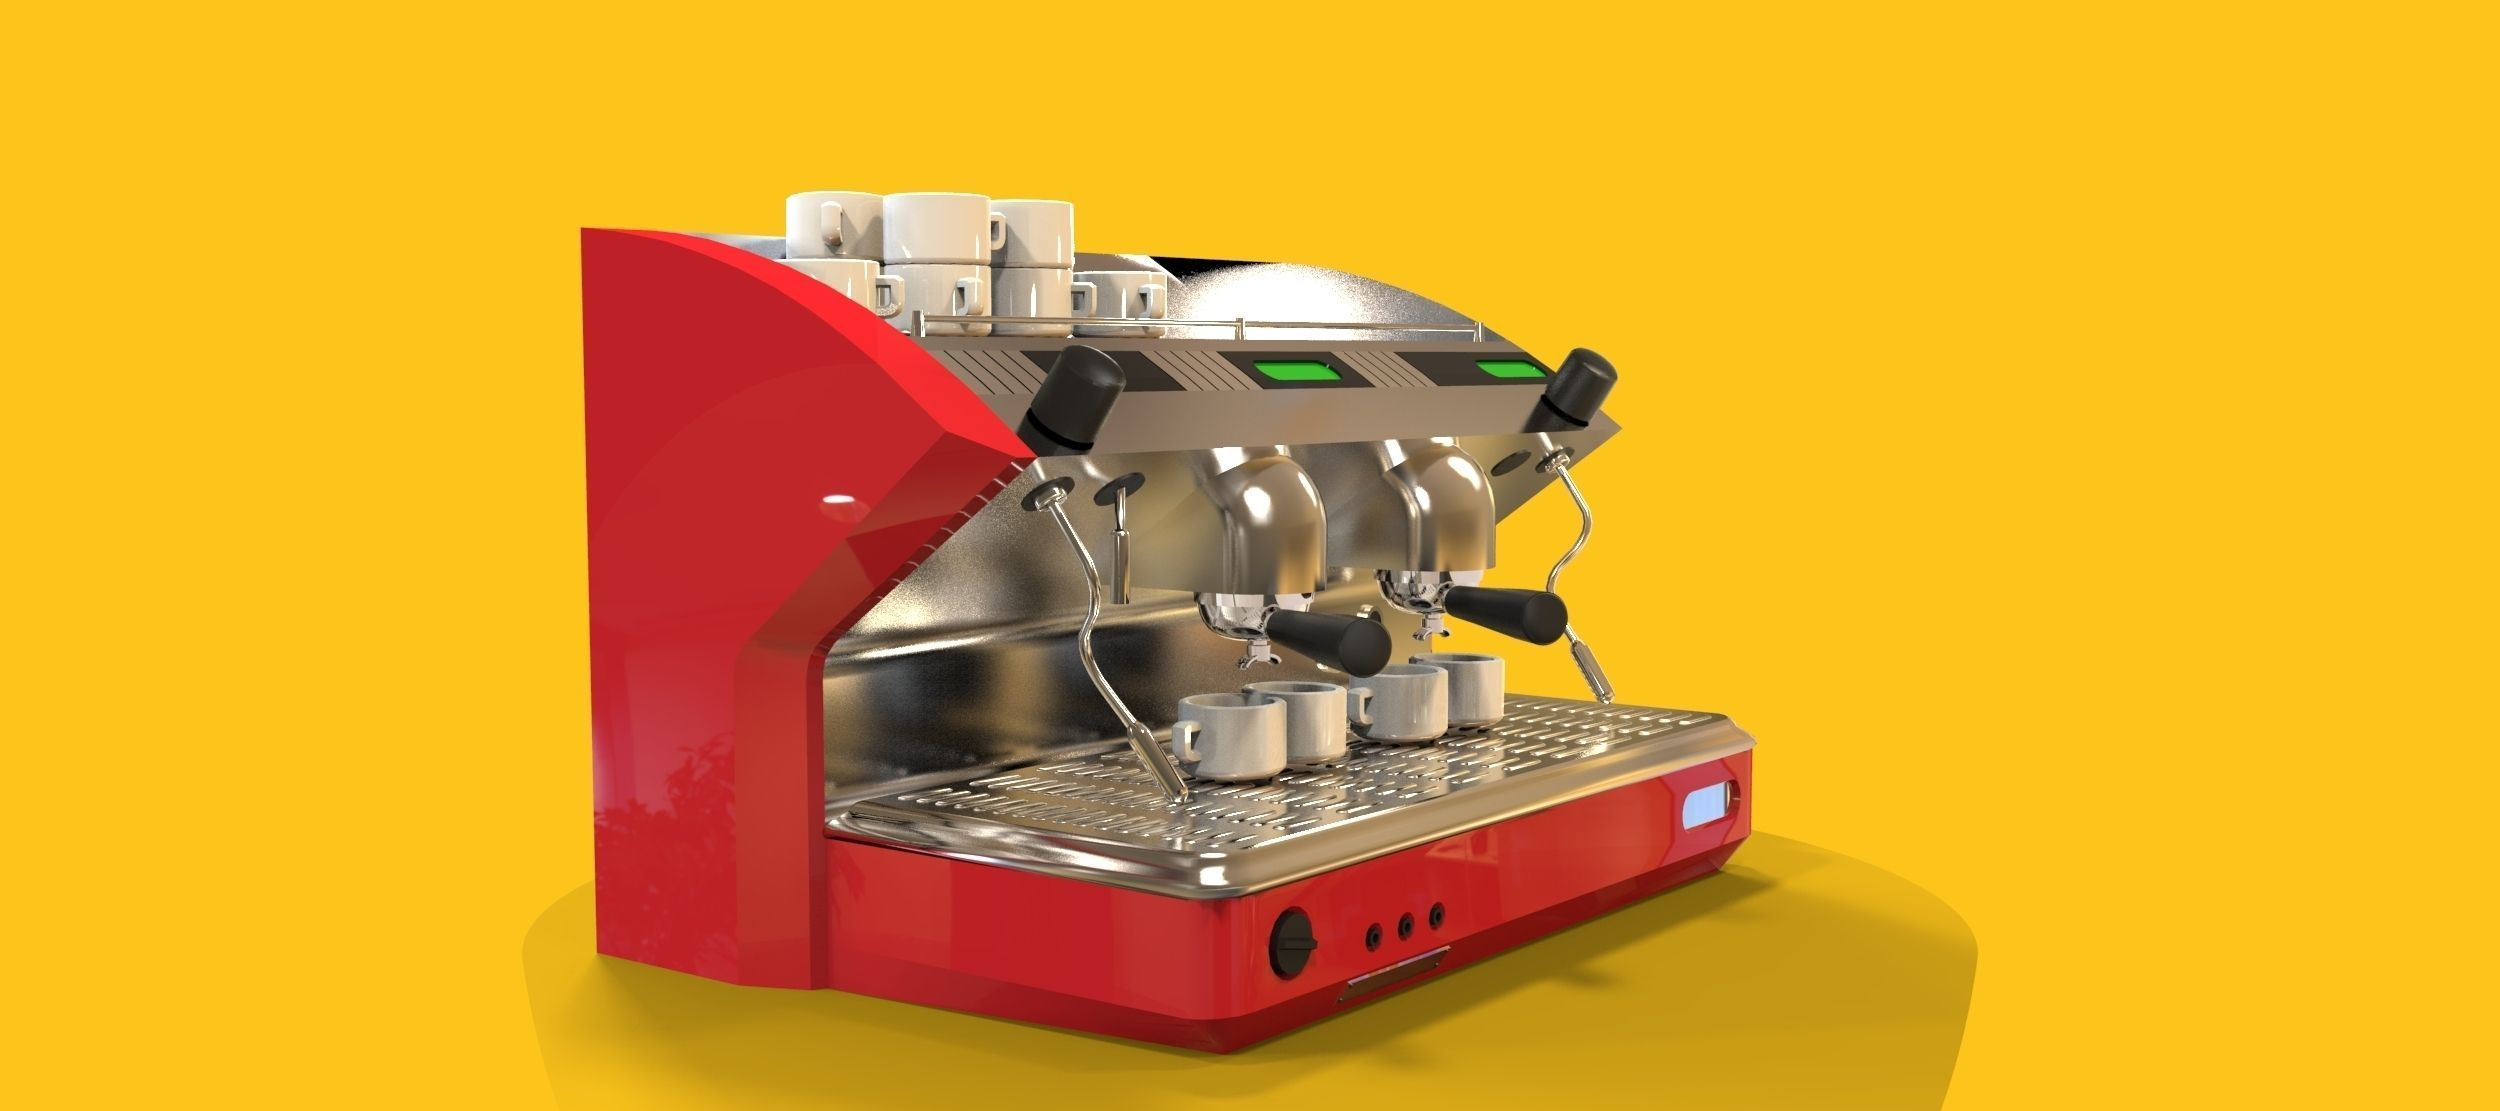 3d Model Coffee Maker Vr Ar Low Poly Max Obj 3ds Fbx